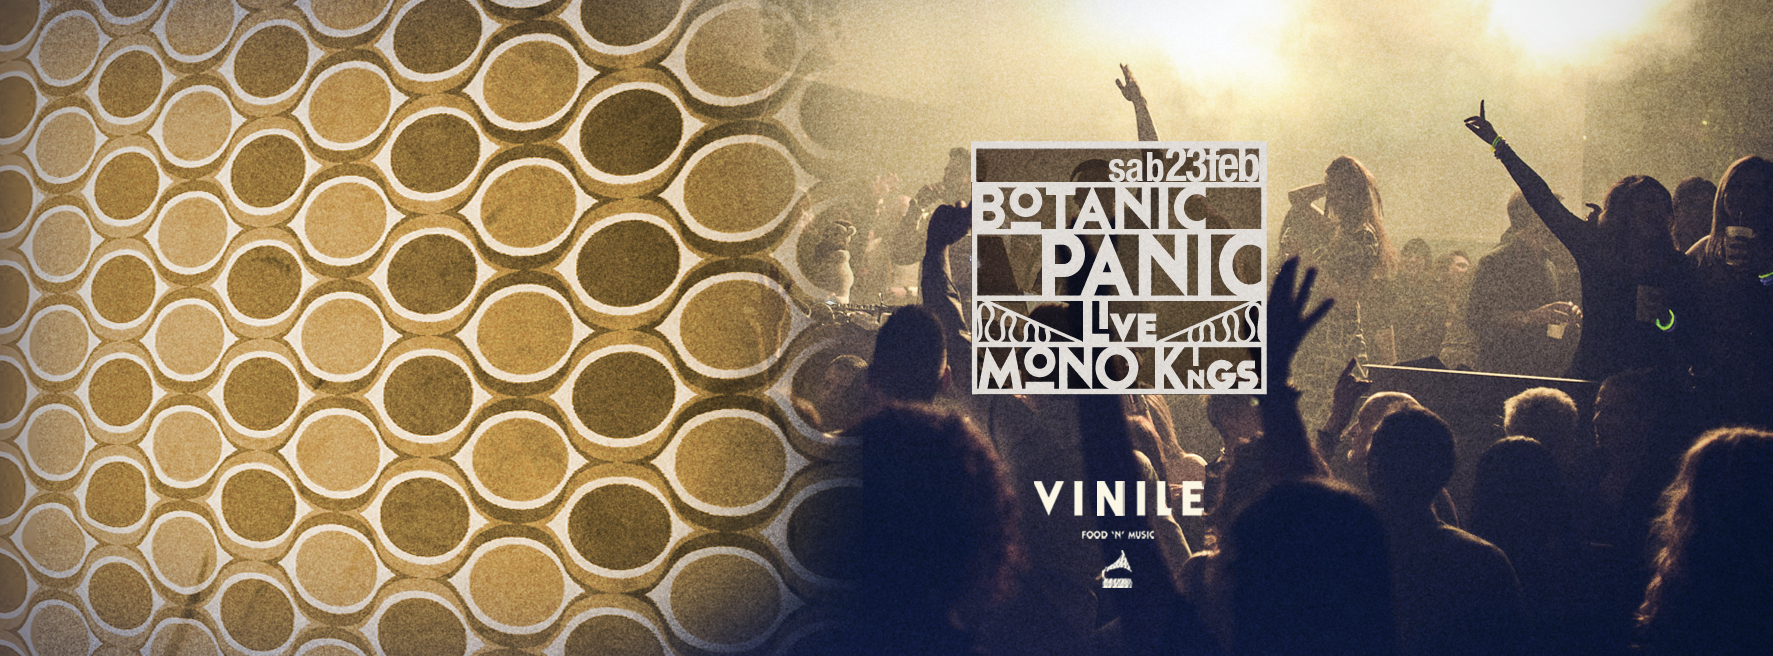 Vinile Sabato 23 febbraio 2019 Aperitiv & Disco BOTANIC PANIC